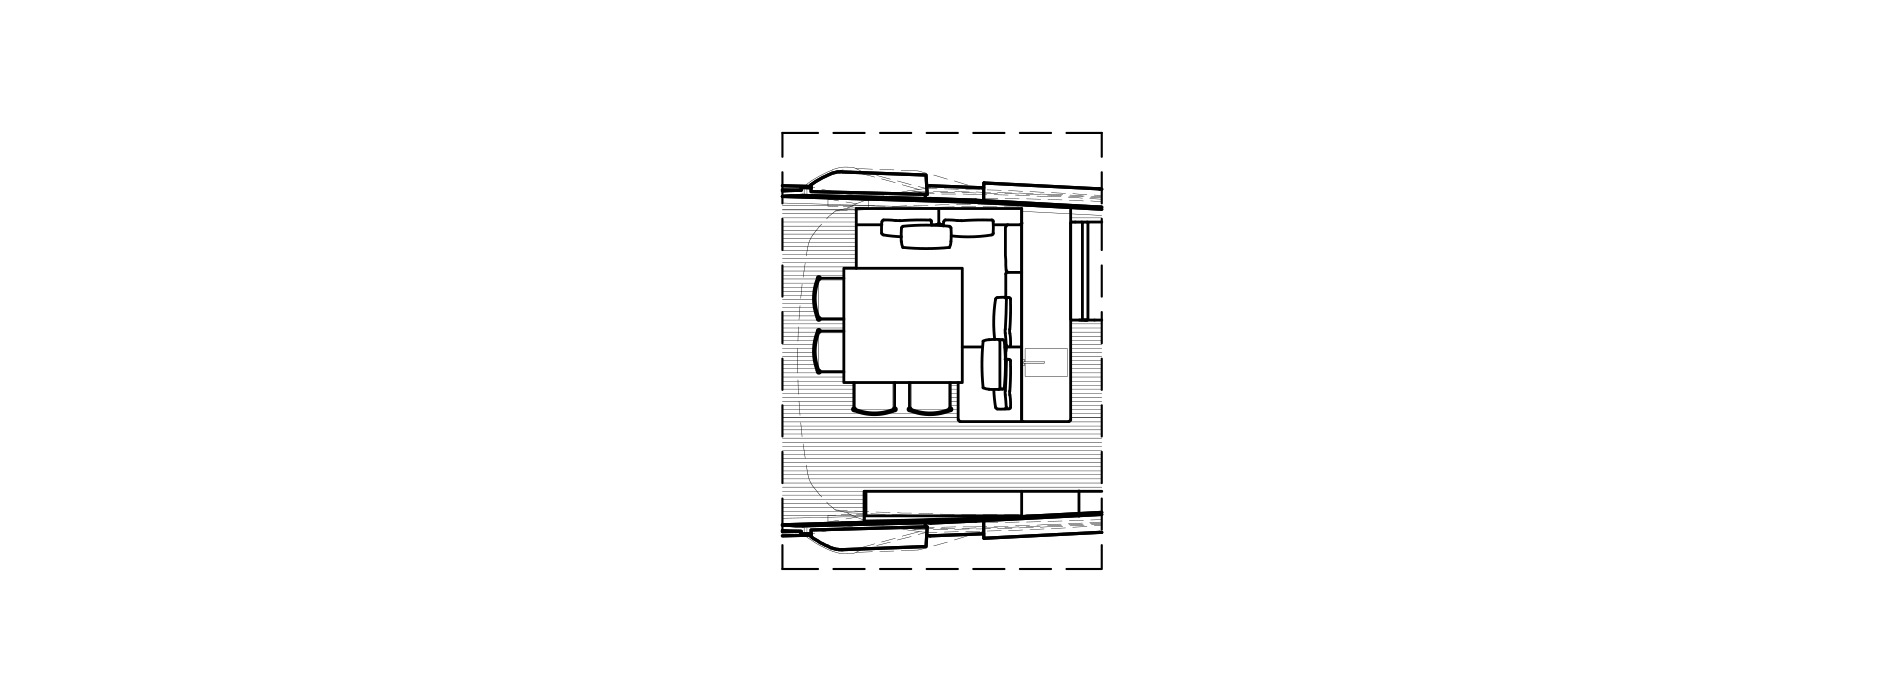 Sanlorenzo Yachts SX76 细节 Versione Lissoni